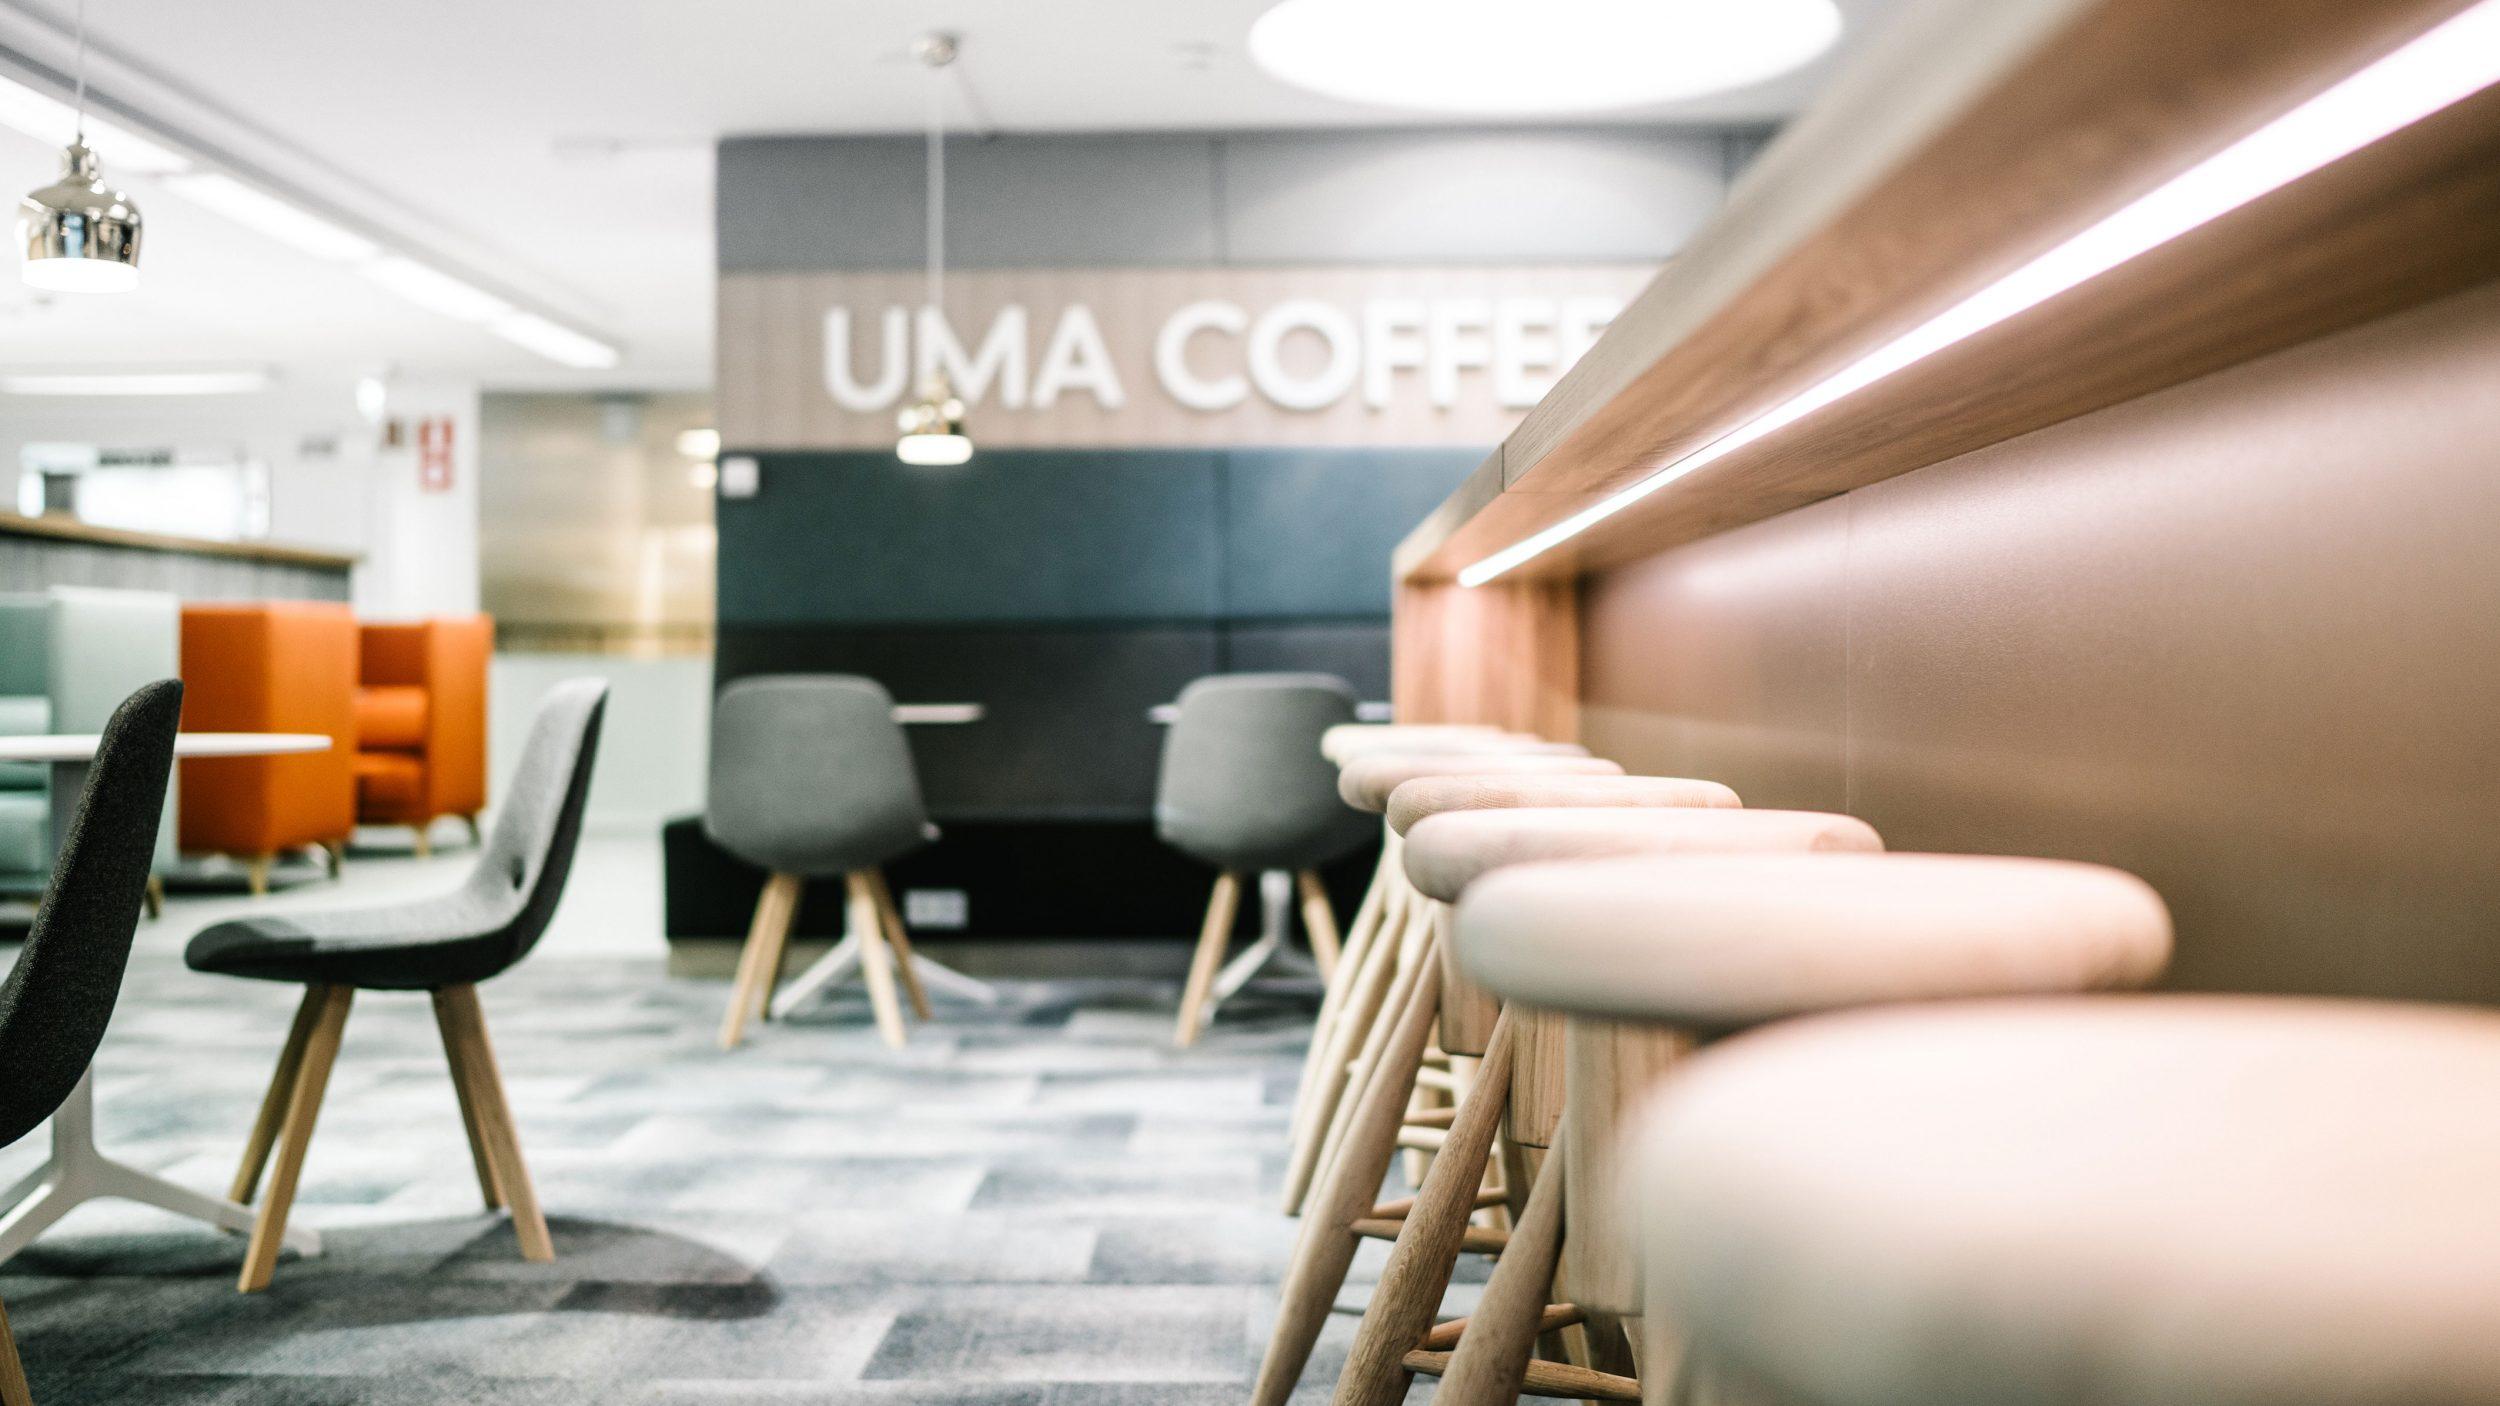 UMA-Esplanadi-Helsinki-GI-Project